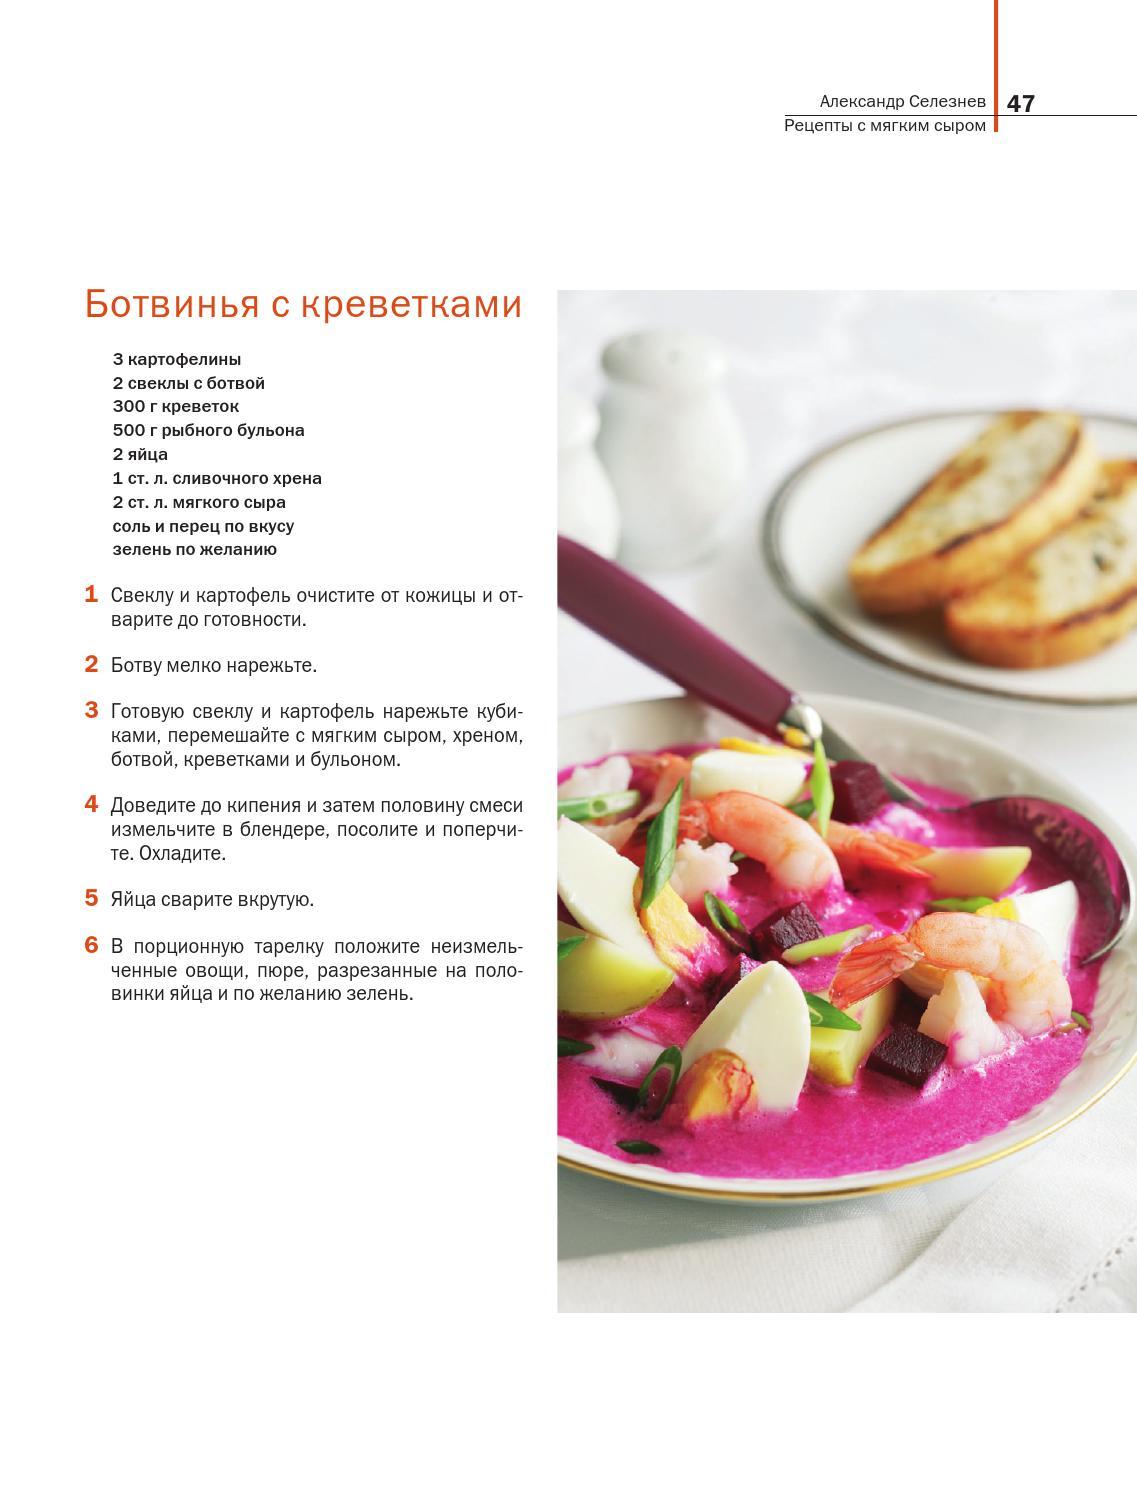 Рецепты александра селезнева канал домашний